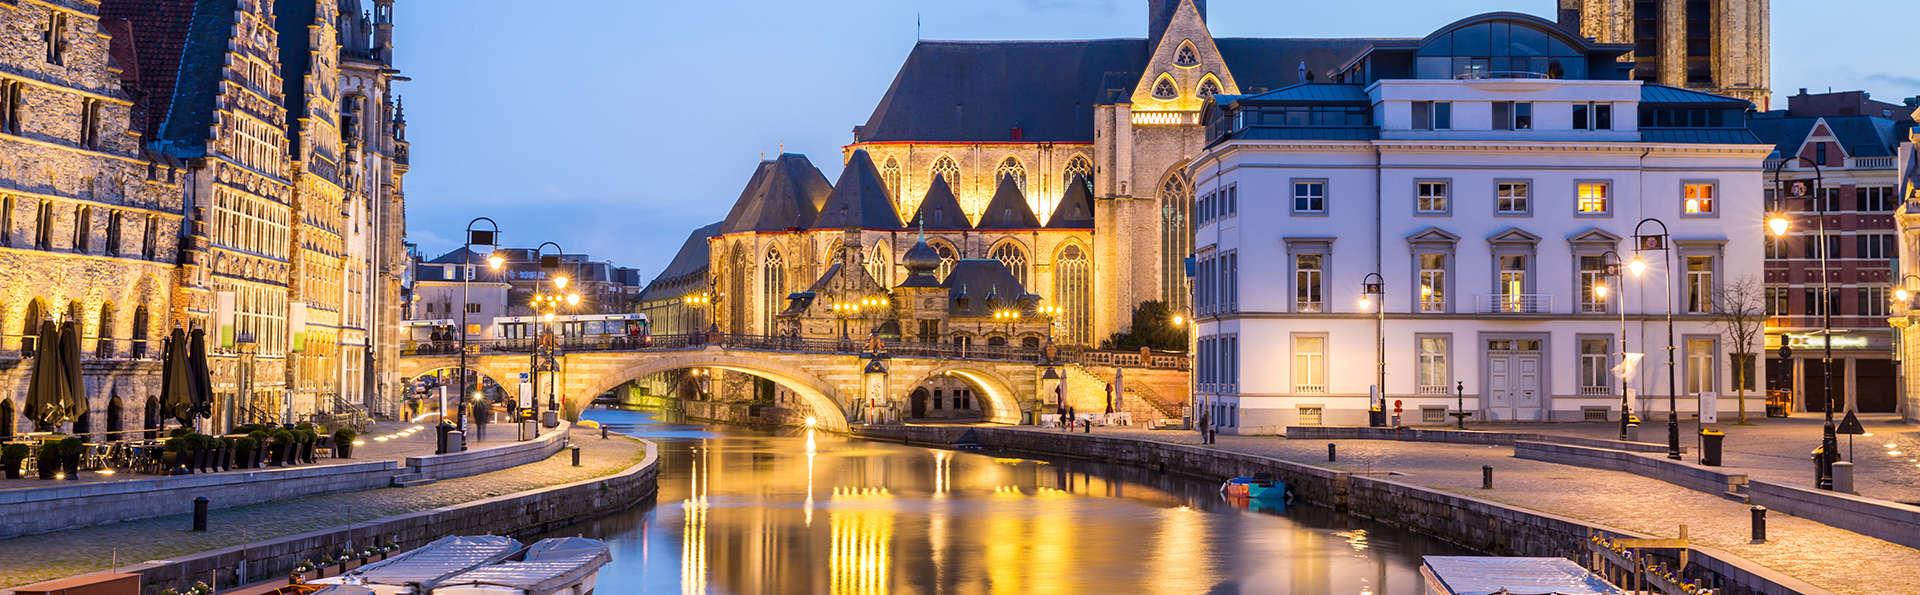 Sandton Grand Hotel Reylof Gent - EDIT_gent6.jpg